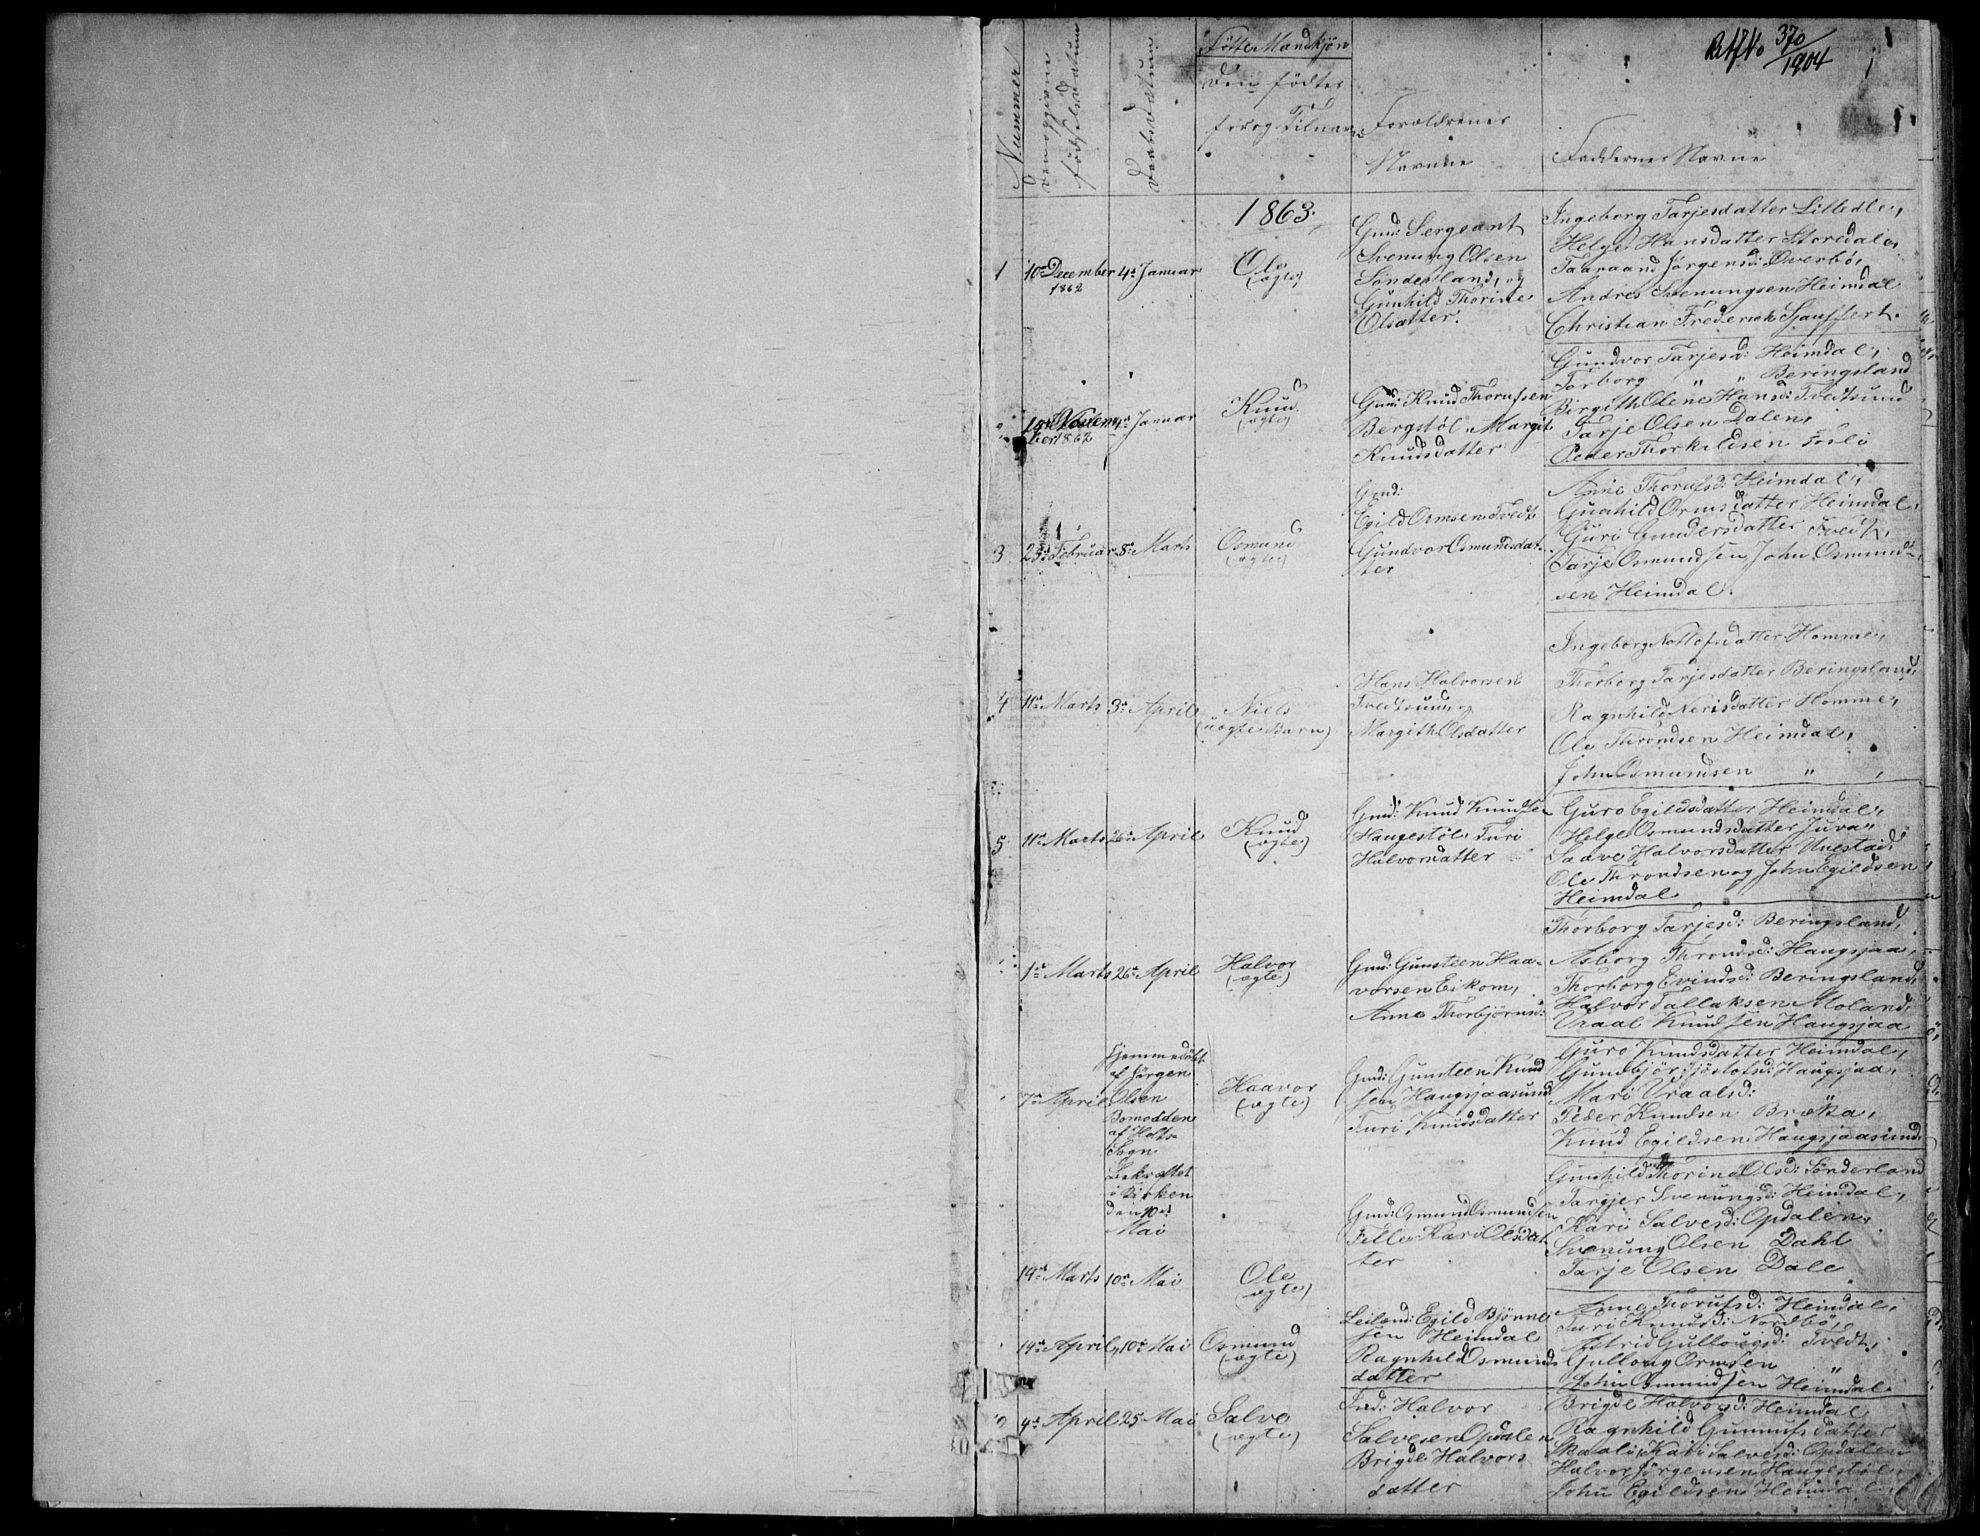 SAKO, Nissedal kirkebøker, G/Gb/L0002: Klokkerbok nr. II 2, 1863-1892, s. 1